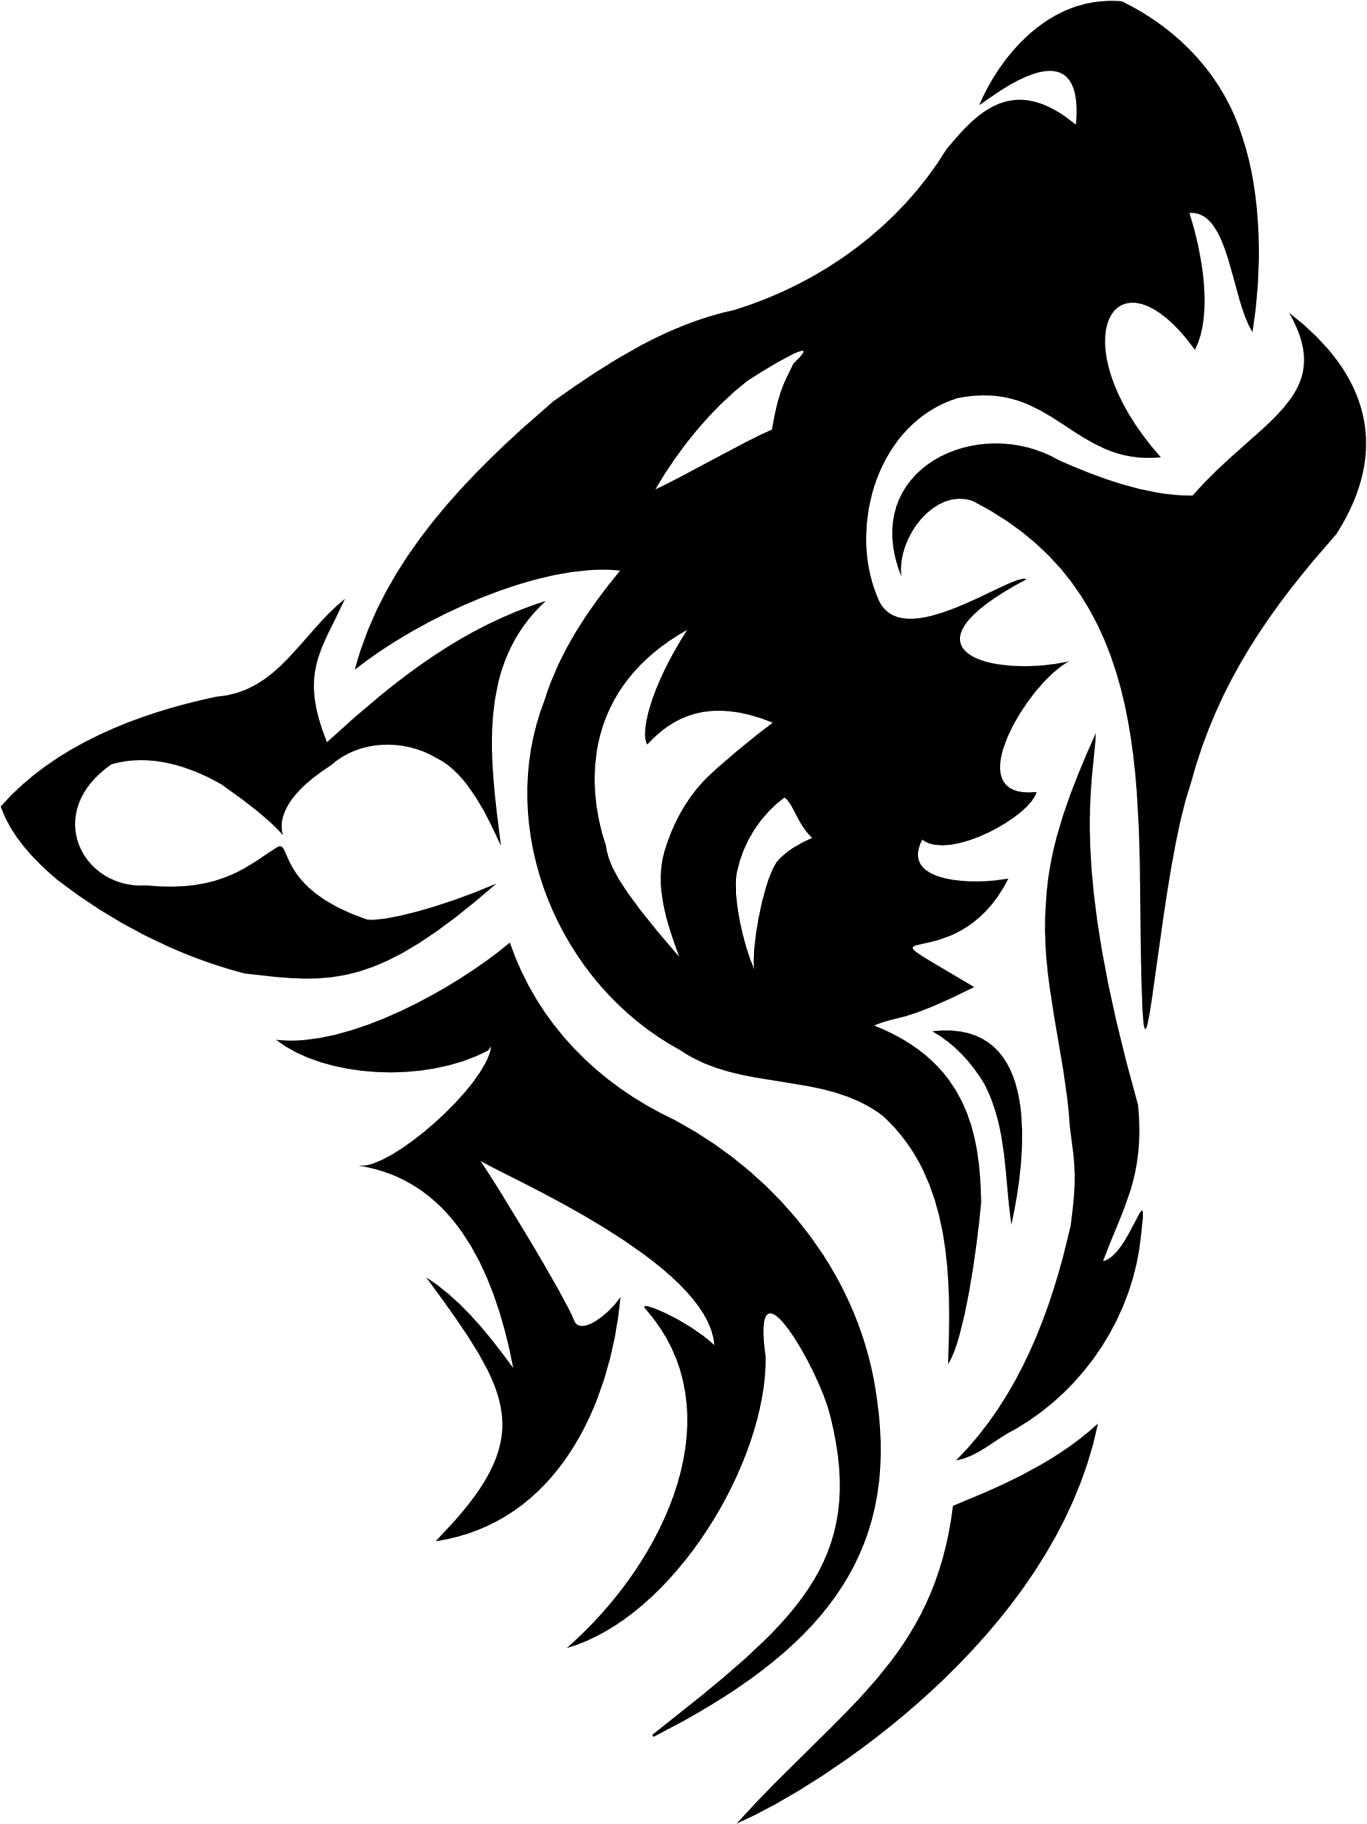 Tribal Outline Tattoo Stencil